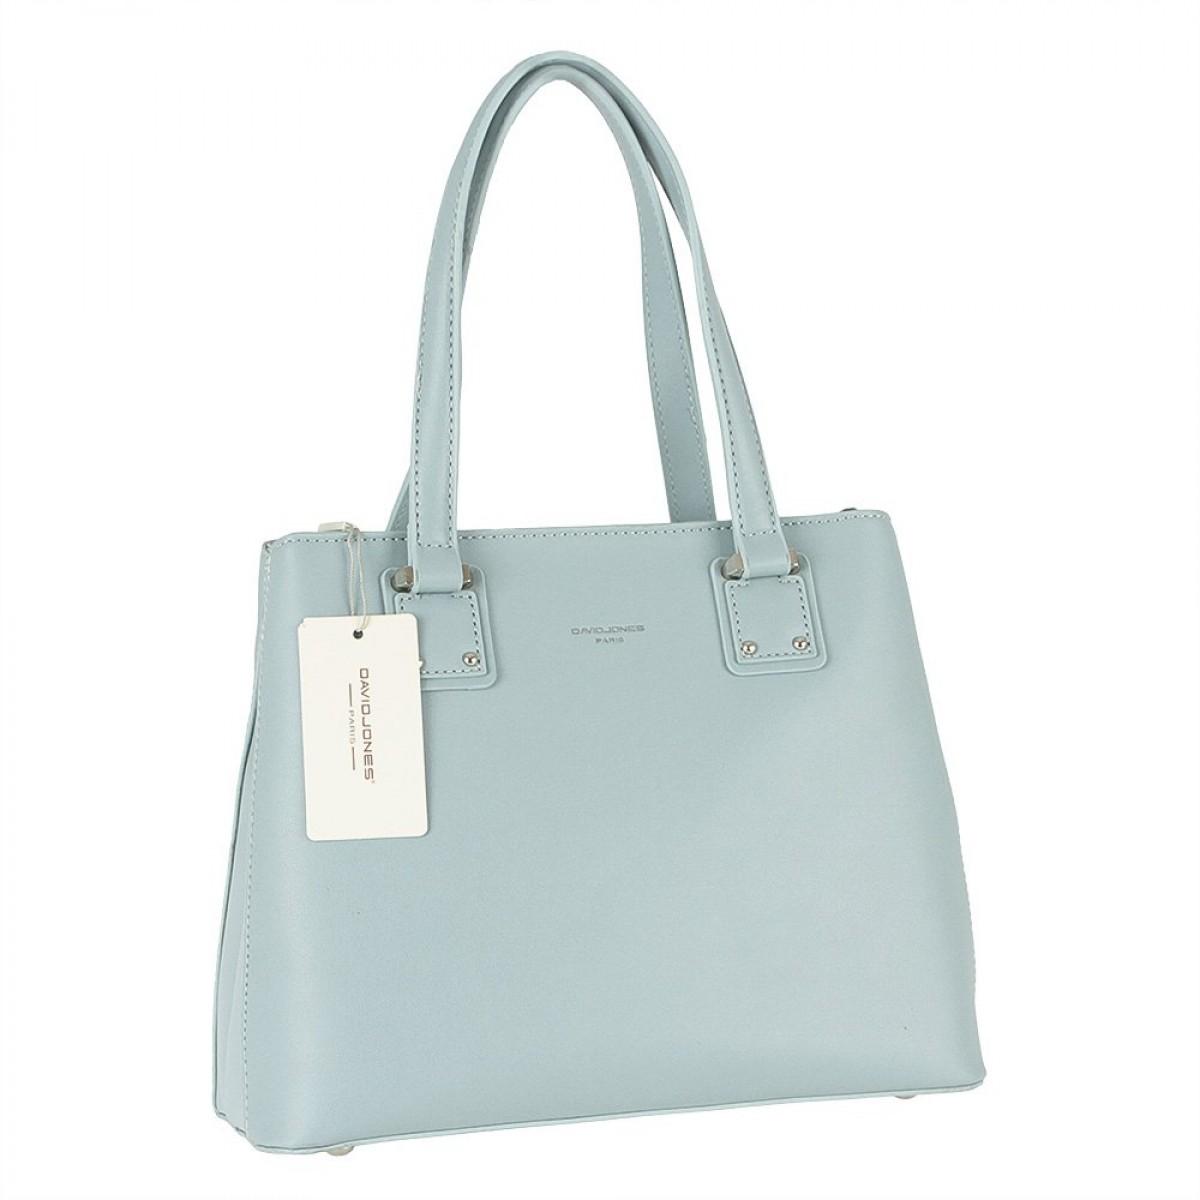 Жіноча сумка David Jones CM5787 PALE BLUE